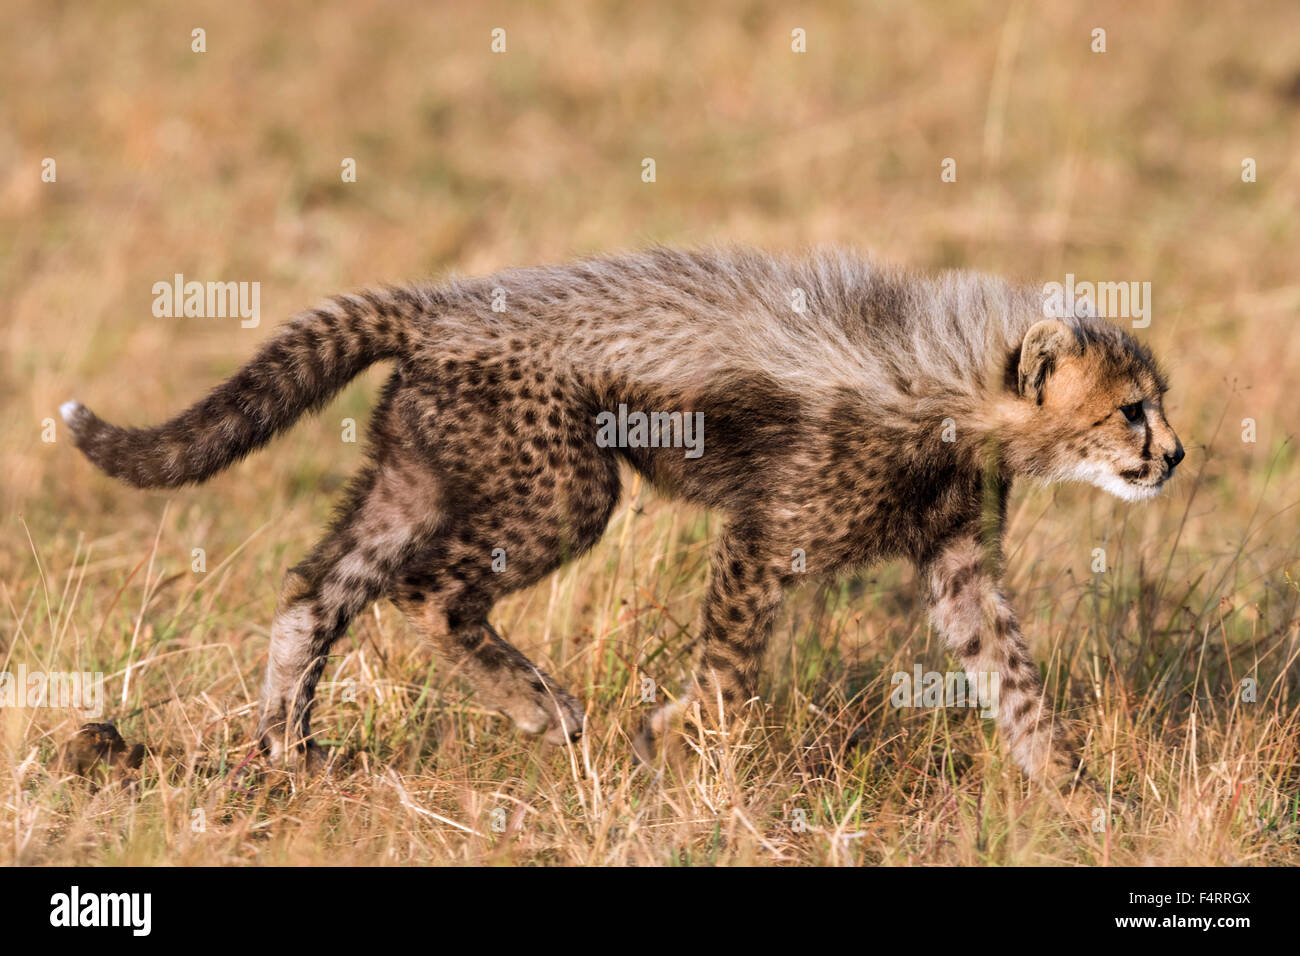 Gepard (Acinonyx Jubatus), sechs Wochen altes Baby Gepard Jungtier erkunden ihre Umgebung, Masai Mara National Reserve, Stockfoto